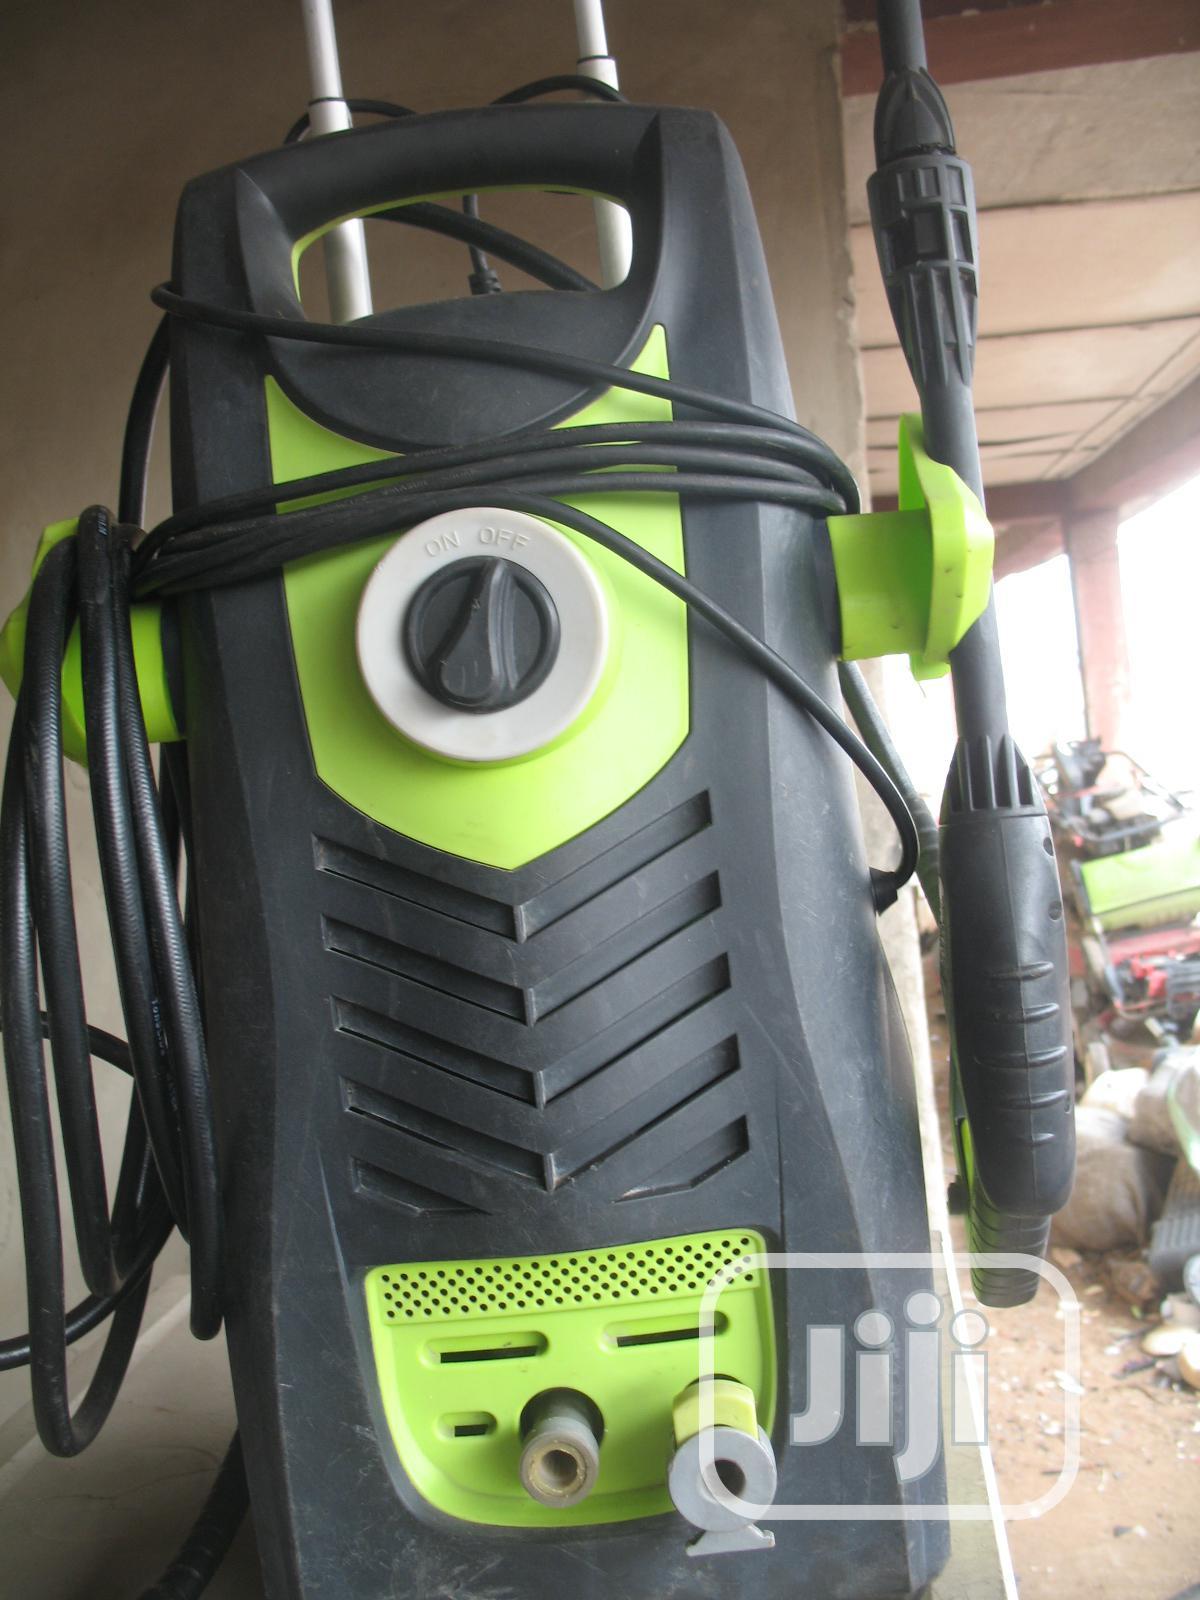 RAC 140 High Pressure Washer (Efficient And Thorough) | Garden for sale in Oshodi, Lagos State, Nigeria